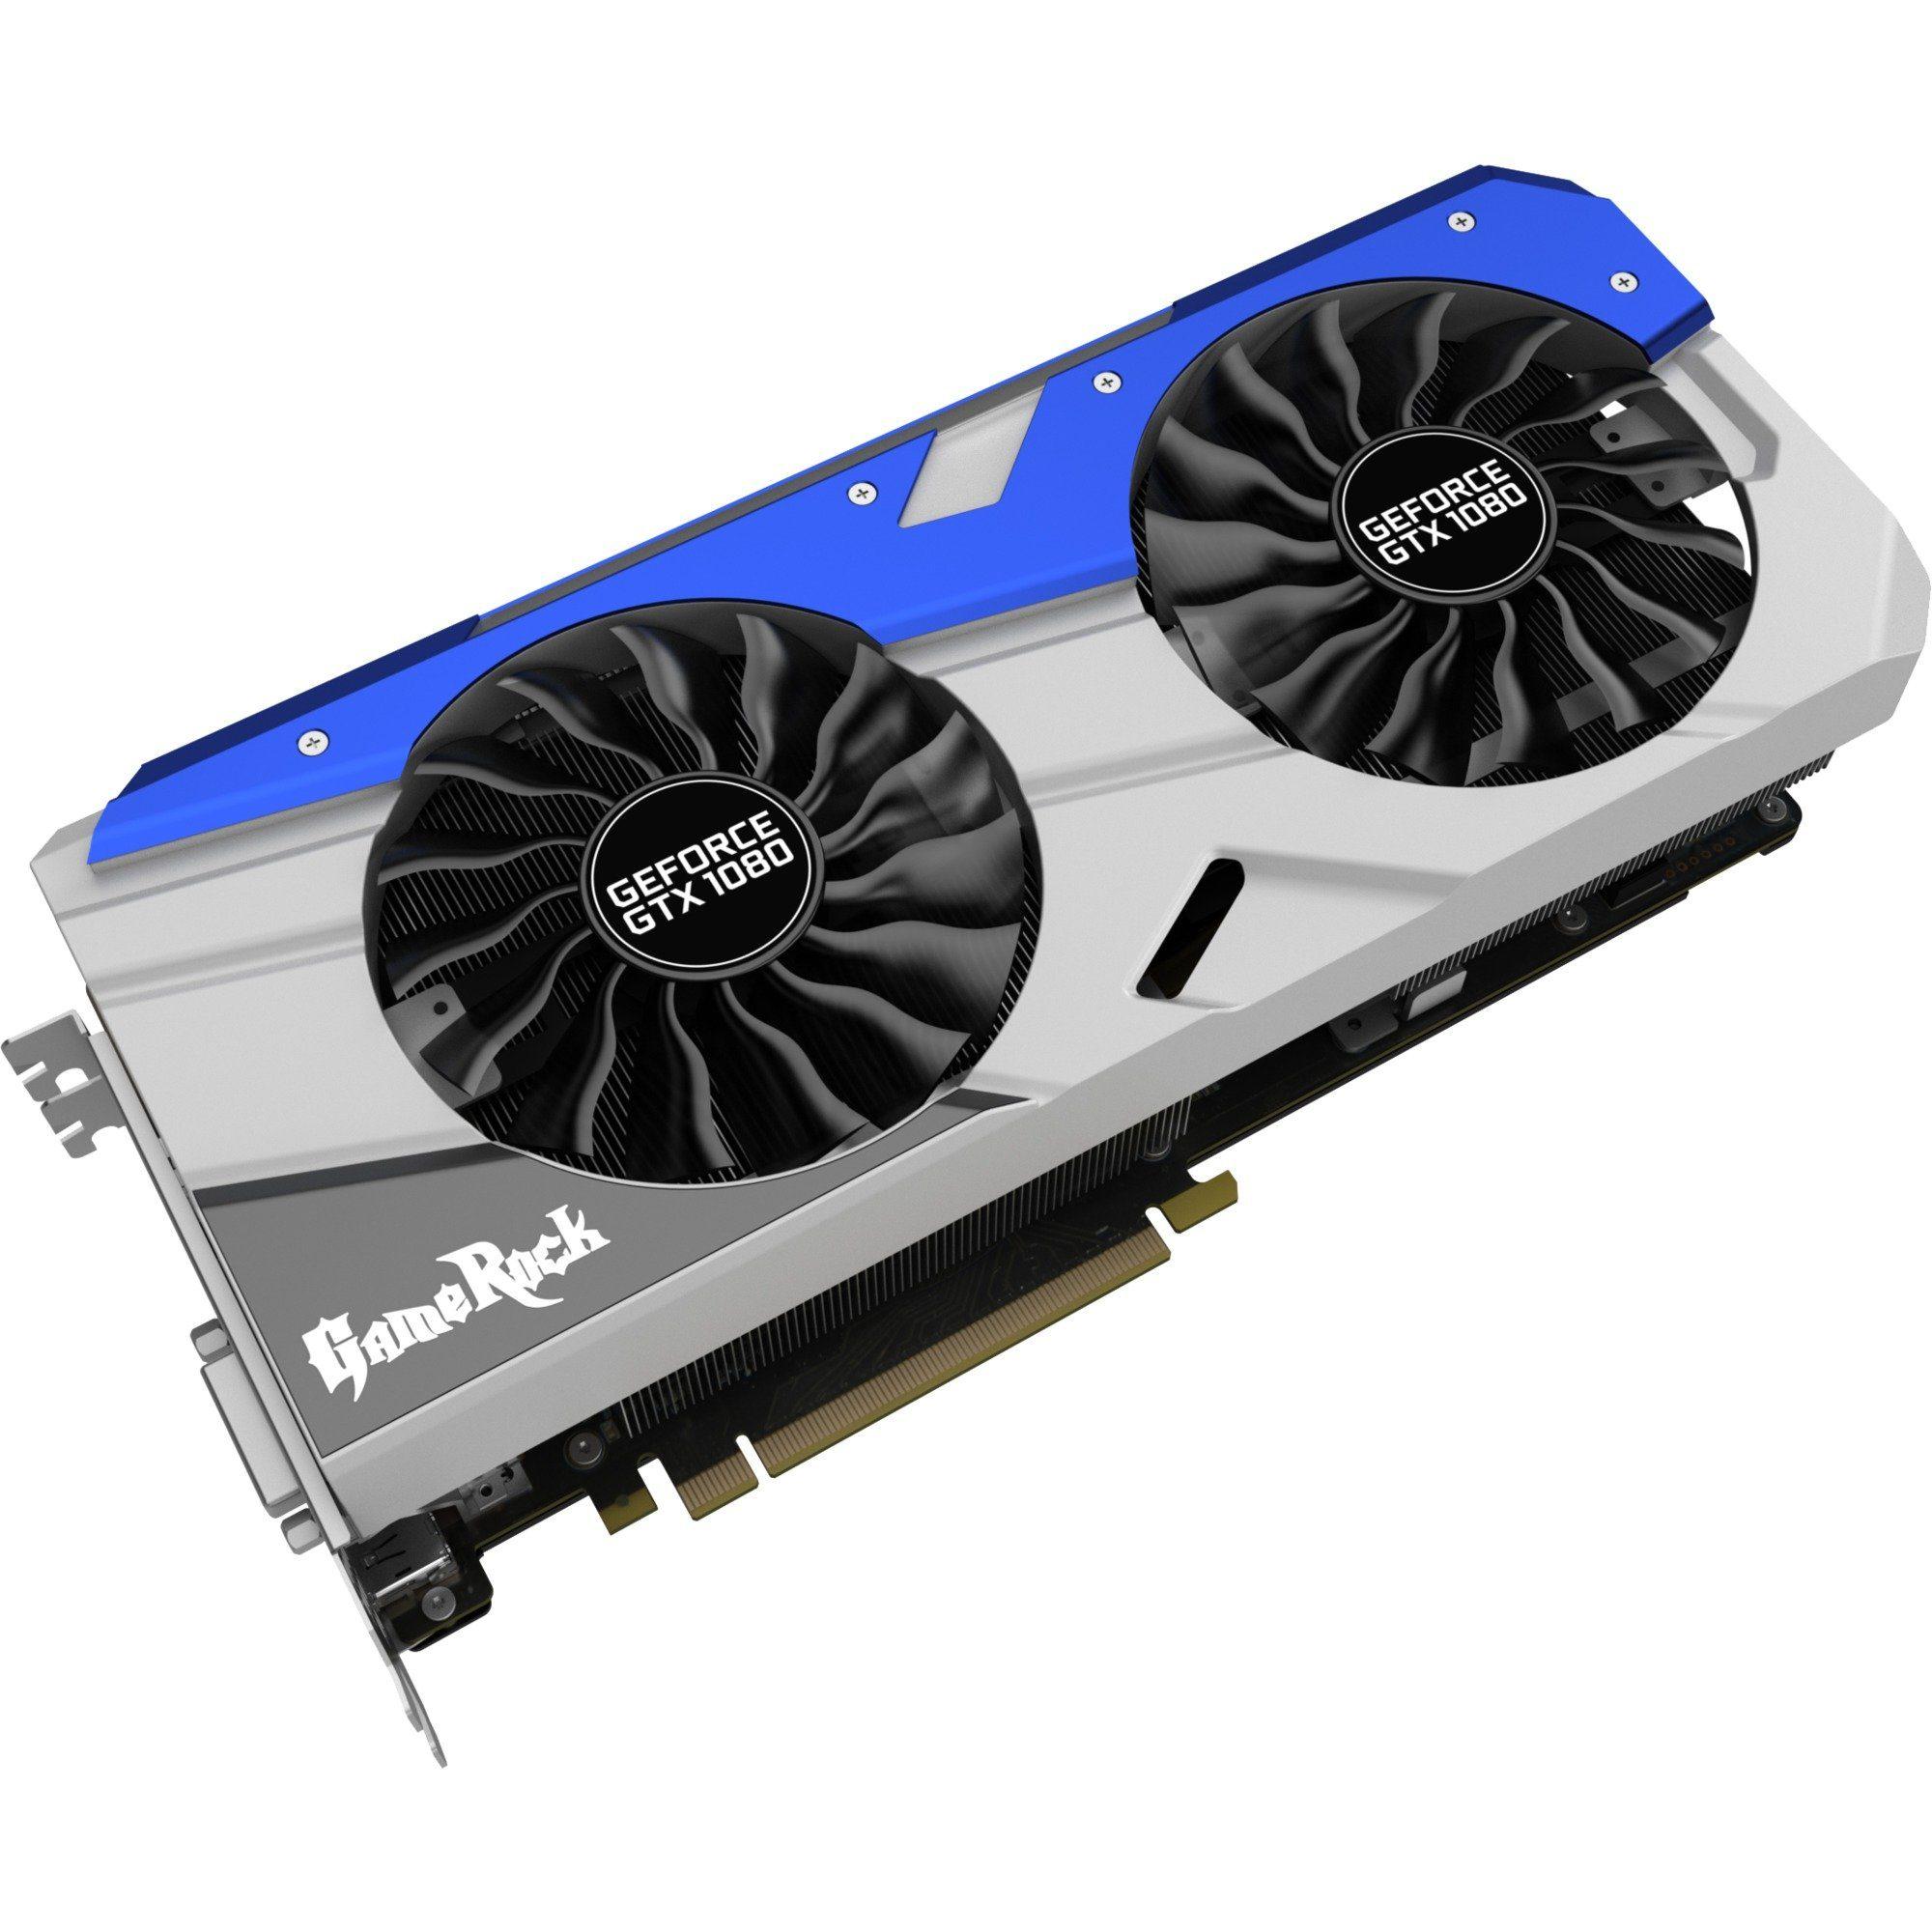 Palit Grafikkarte »GeForce GTX 1080 Gamerock Premium«